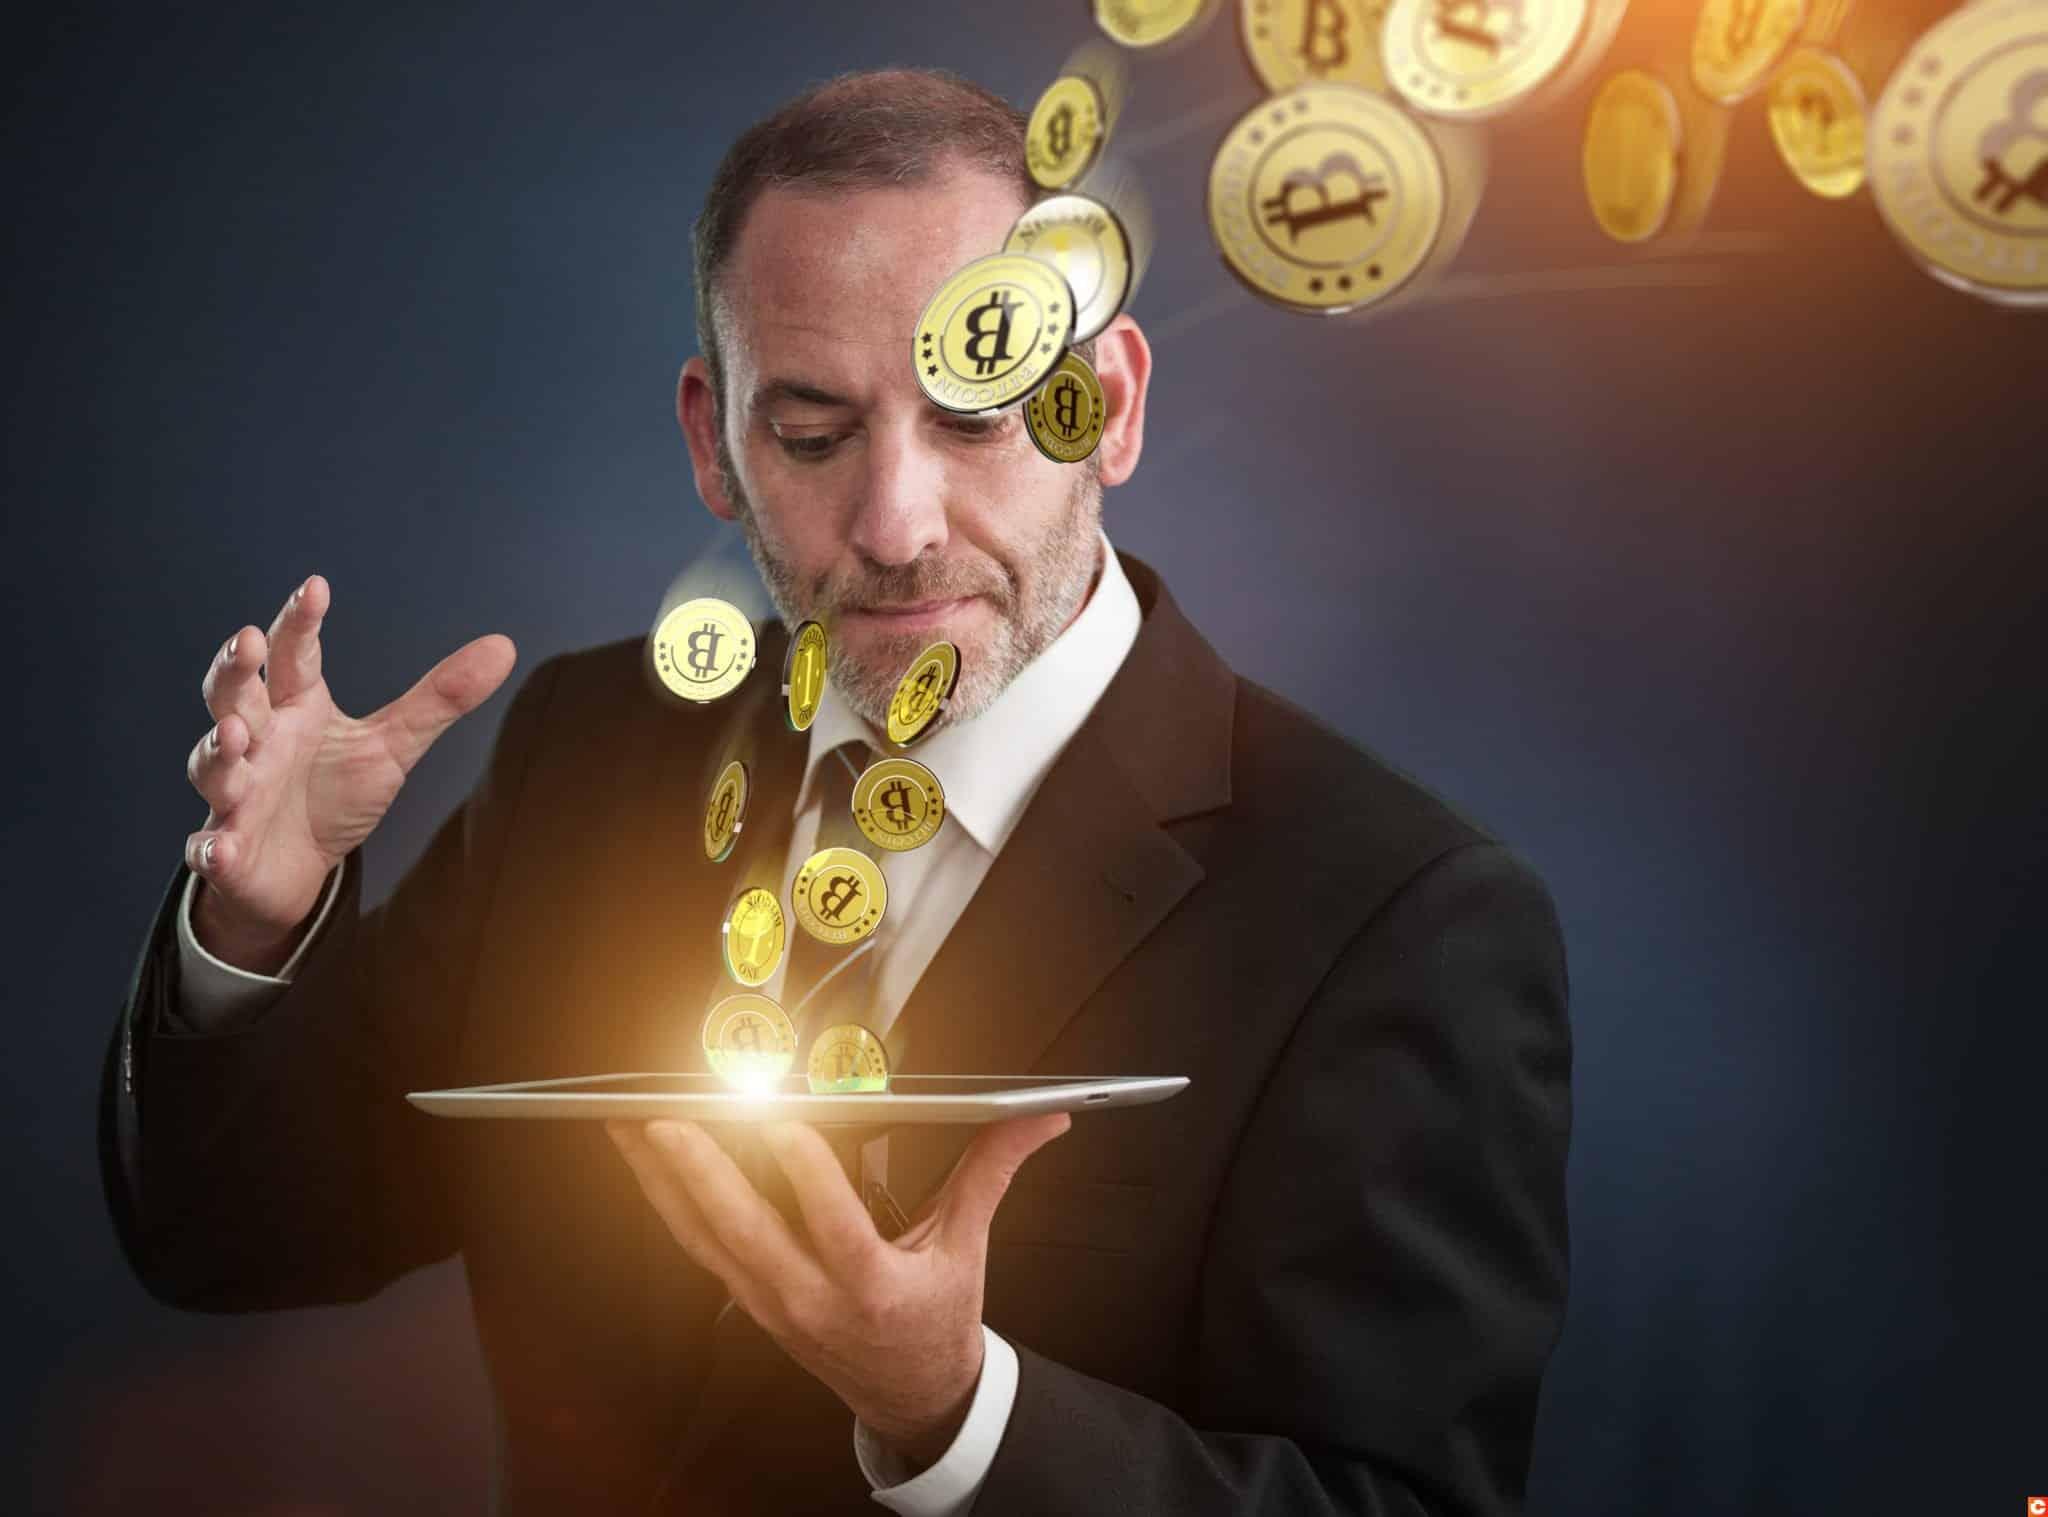 Grayscale un demi-million Bitcoins